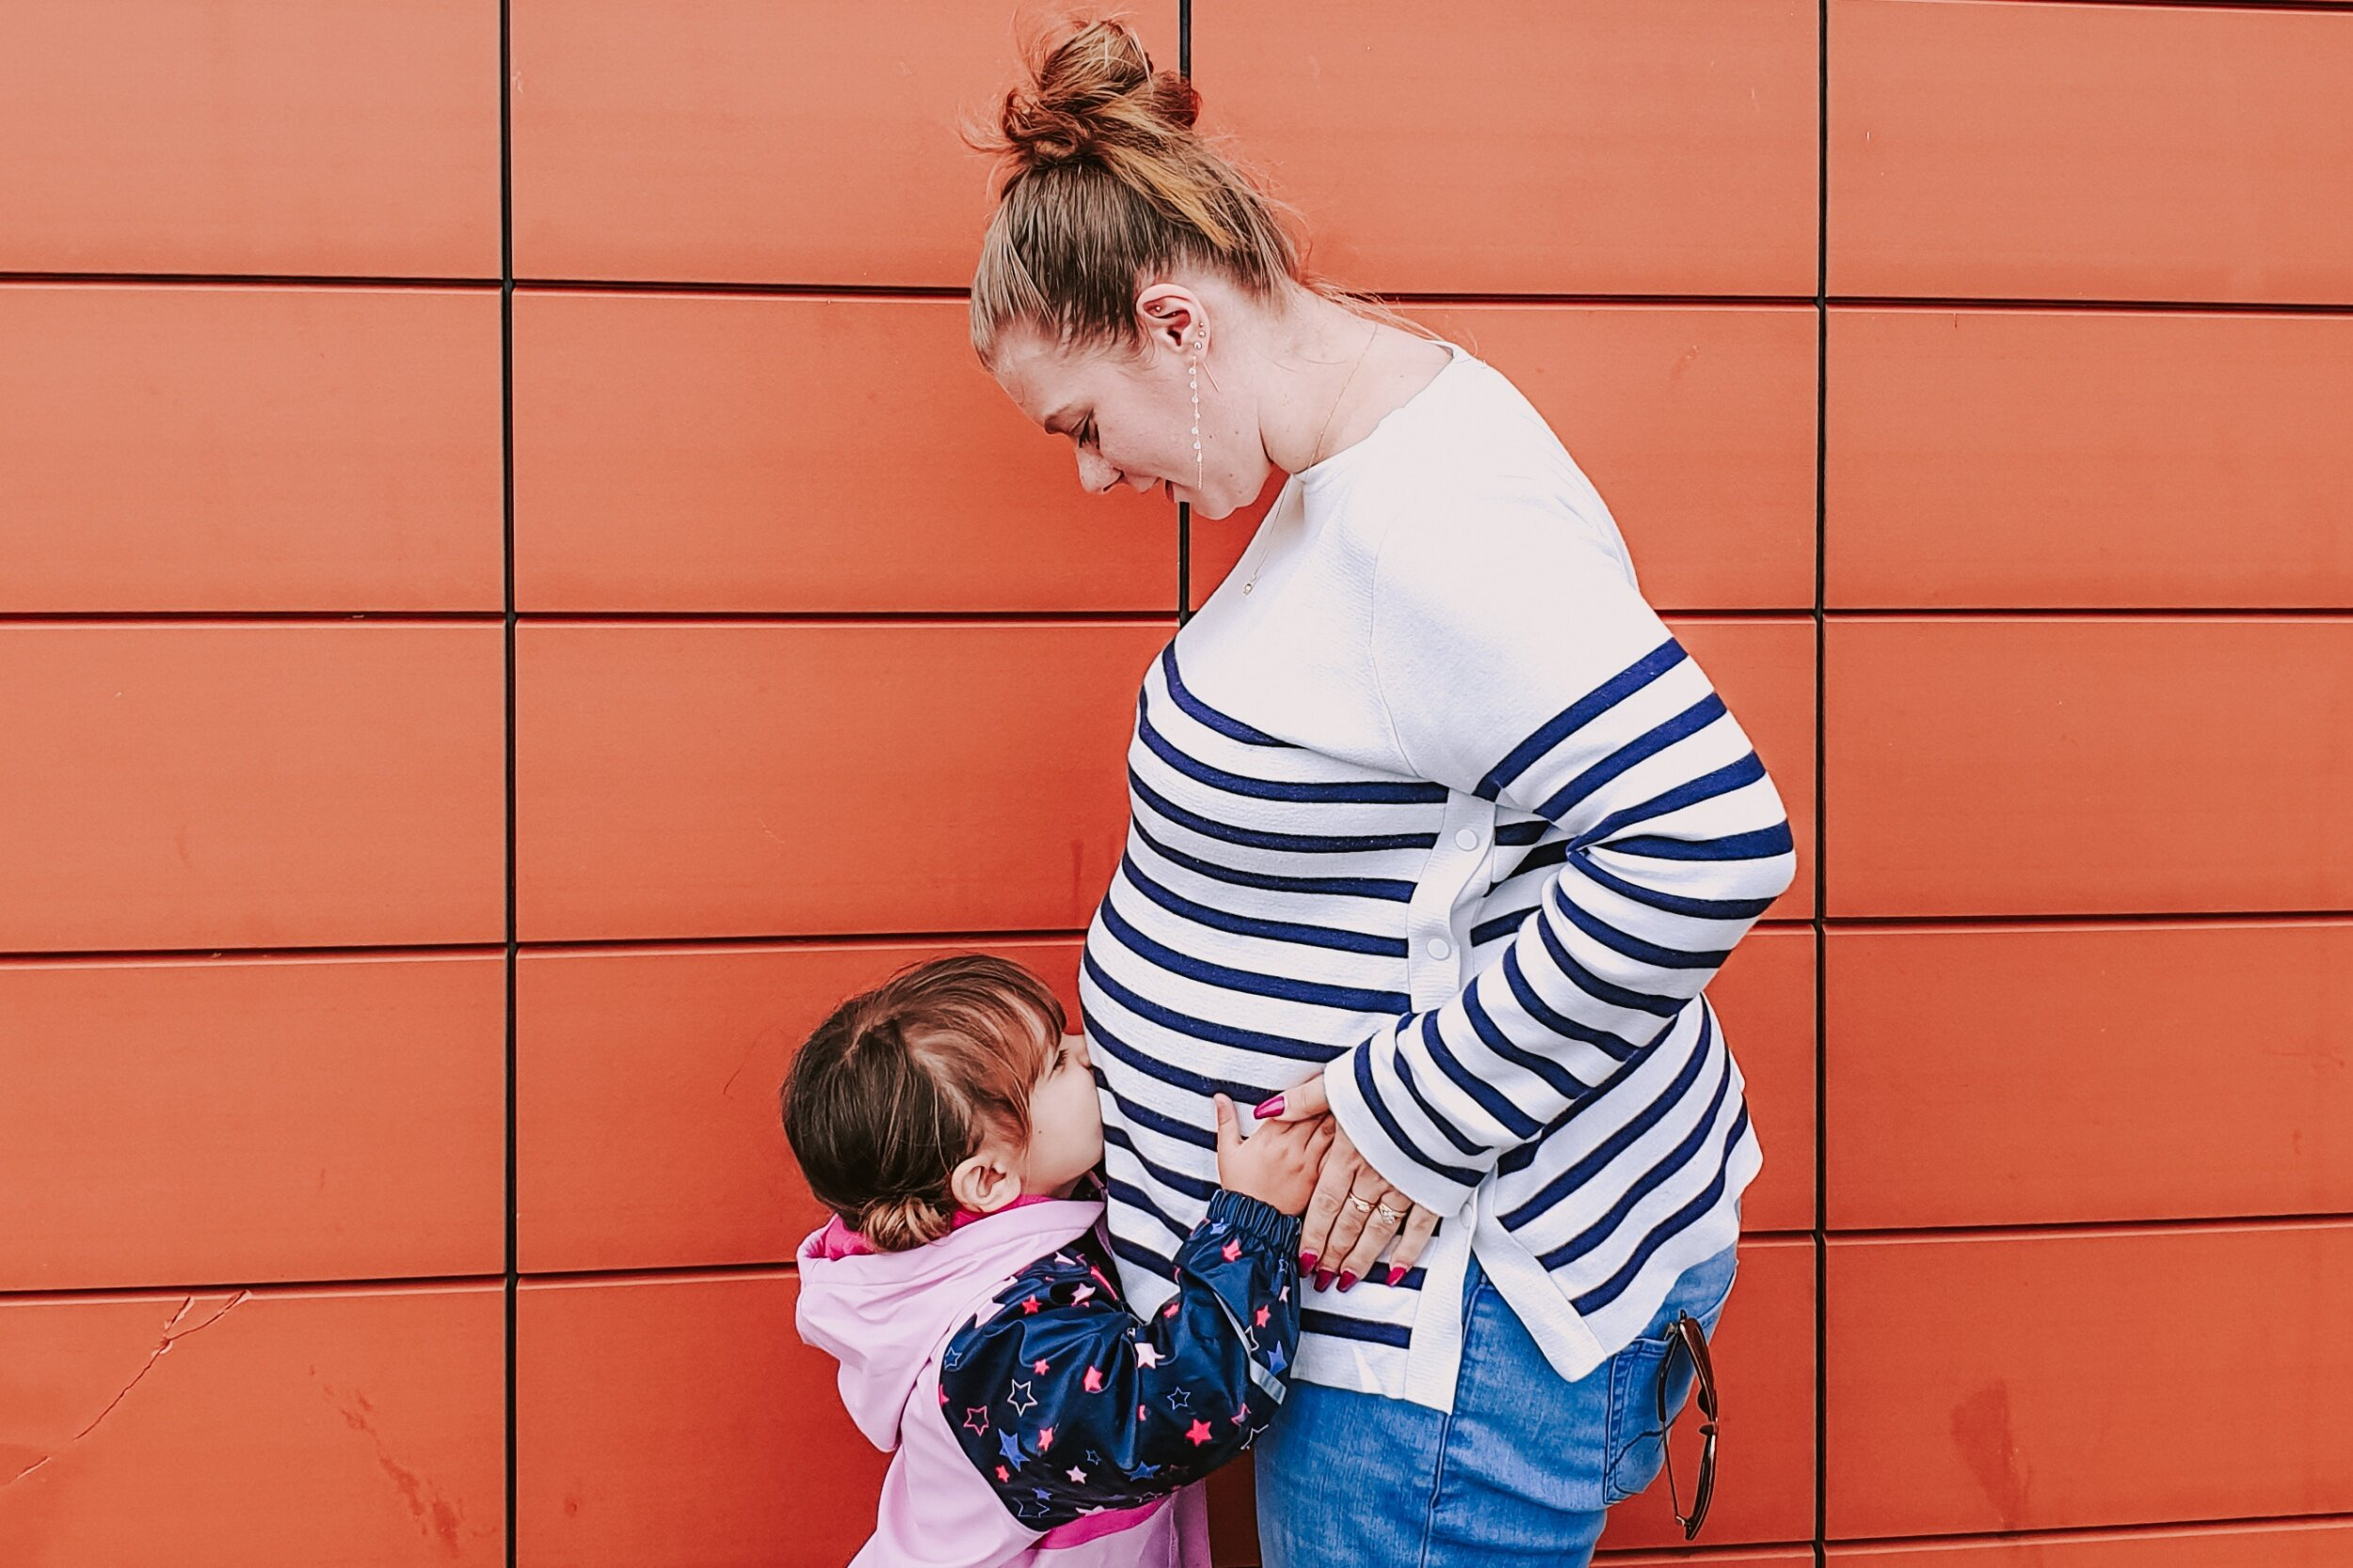 19 weeks pregnant big sister kisses